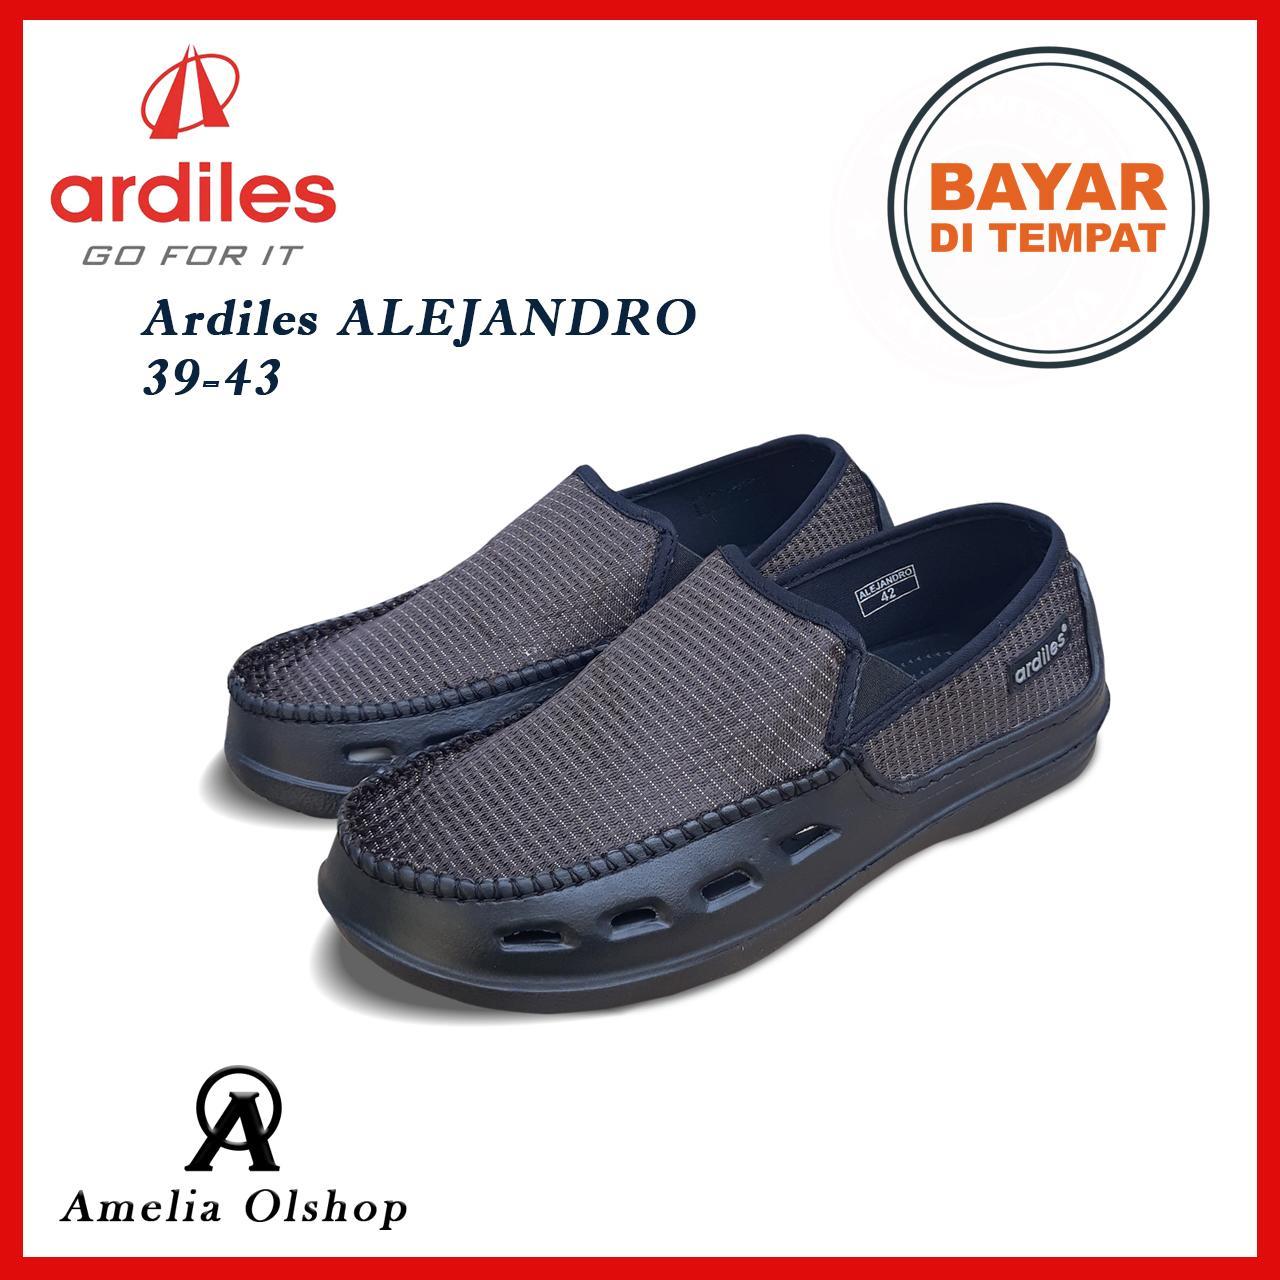 Amelia Olshop - Sepatu Ardiles Croc ALEJANDRO 39-43   Sepatu Pria   Sepatu  Slip 9d7205026b